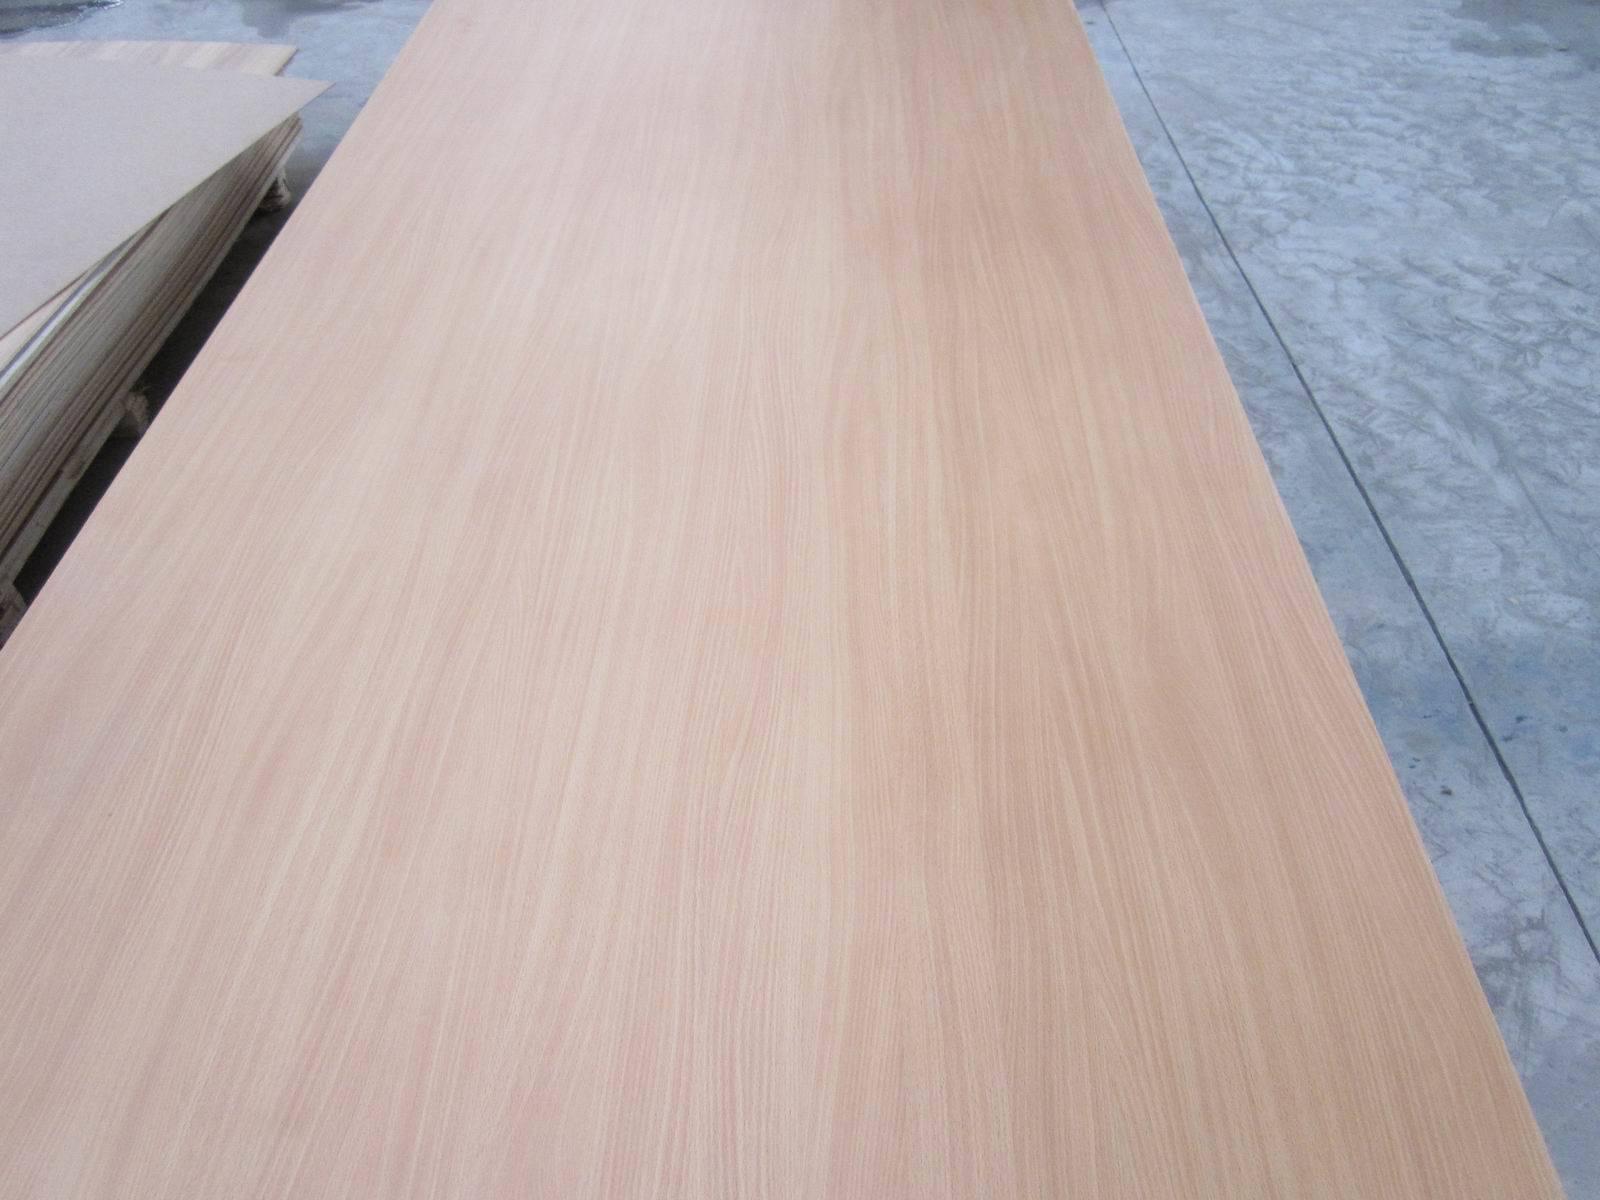 Hight Quality Melamine MDF for Furniture, Furniture MDF, Decorative MDF, AA Grade MDF